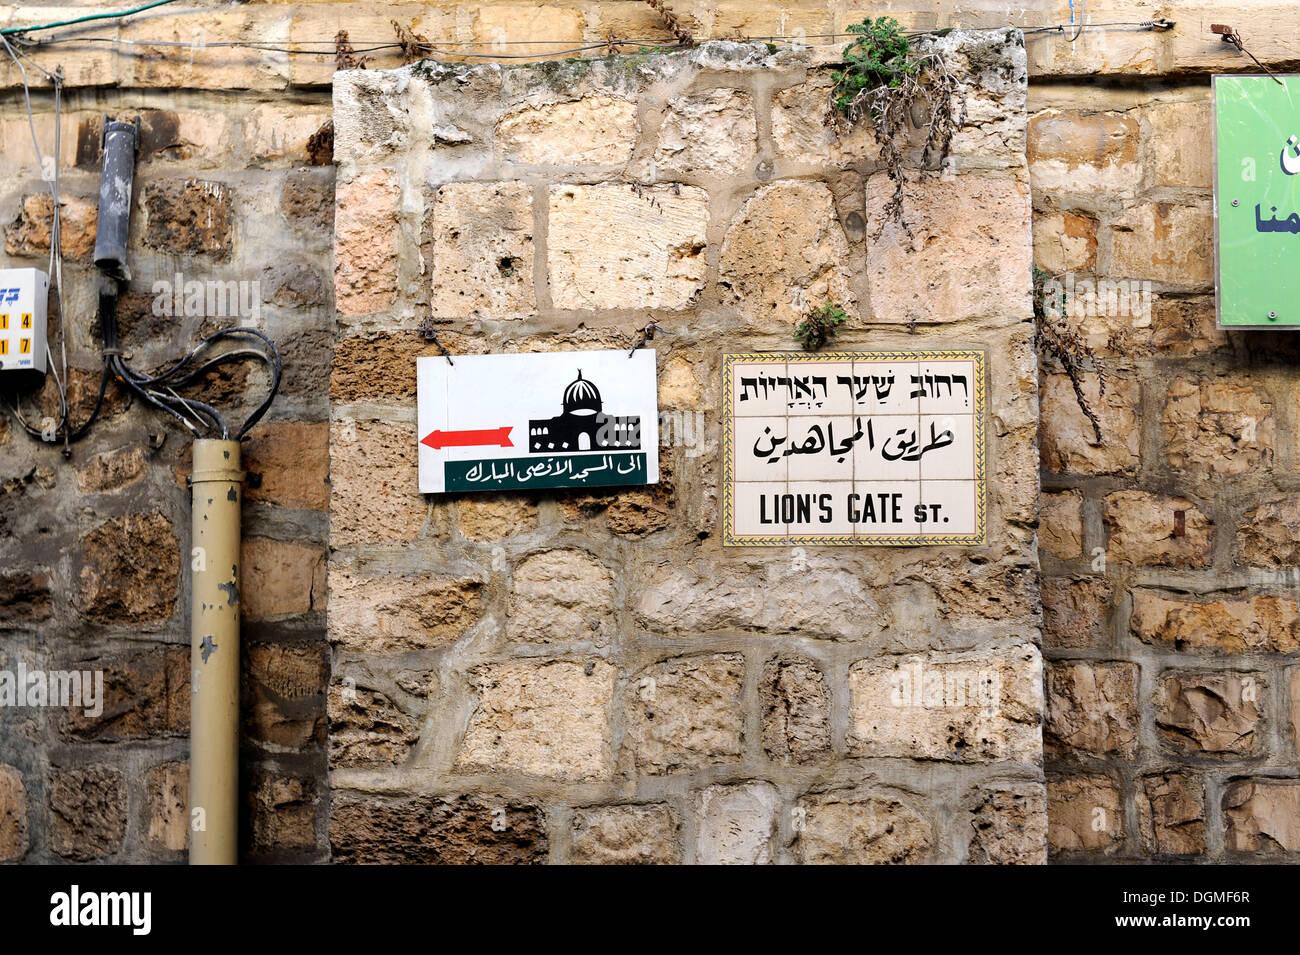 Start of Via Dolorosa, Way of Suffering, at the Lion's Gate, Muslim Quarter, Old City of Jerusalem, Israel, - Stock Image